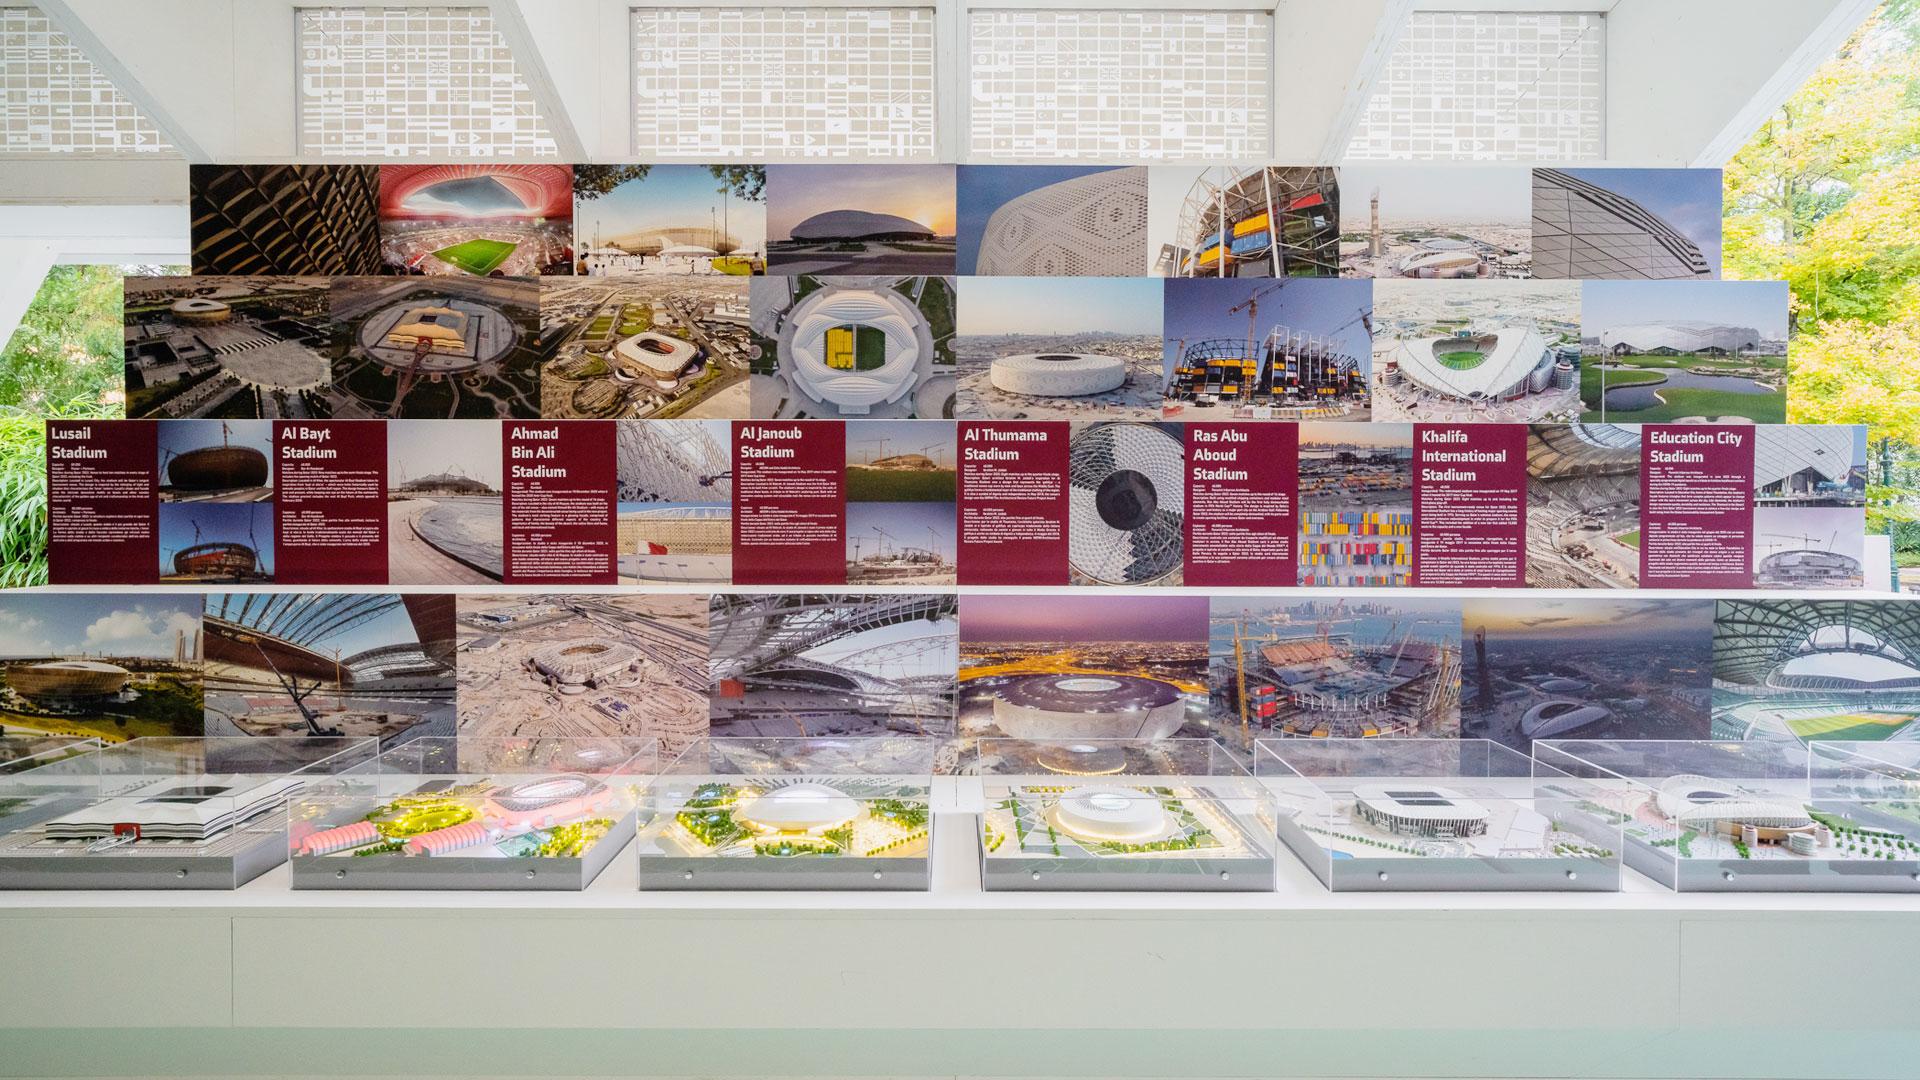 3-2-1 Qatar & Olympic Sports Museum to be featured at La Biennale di Venezia